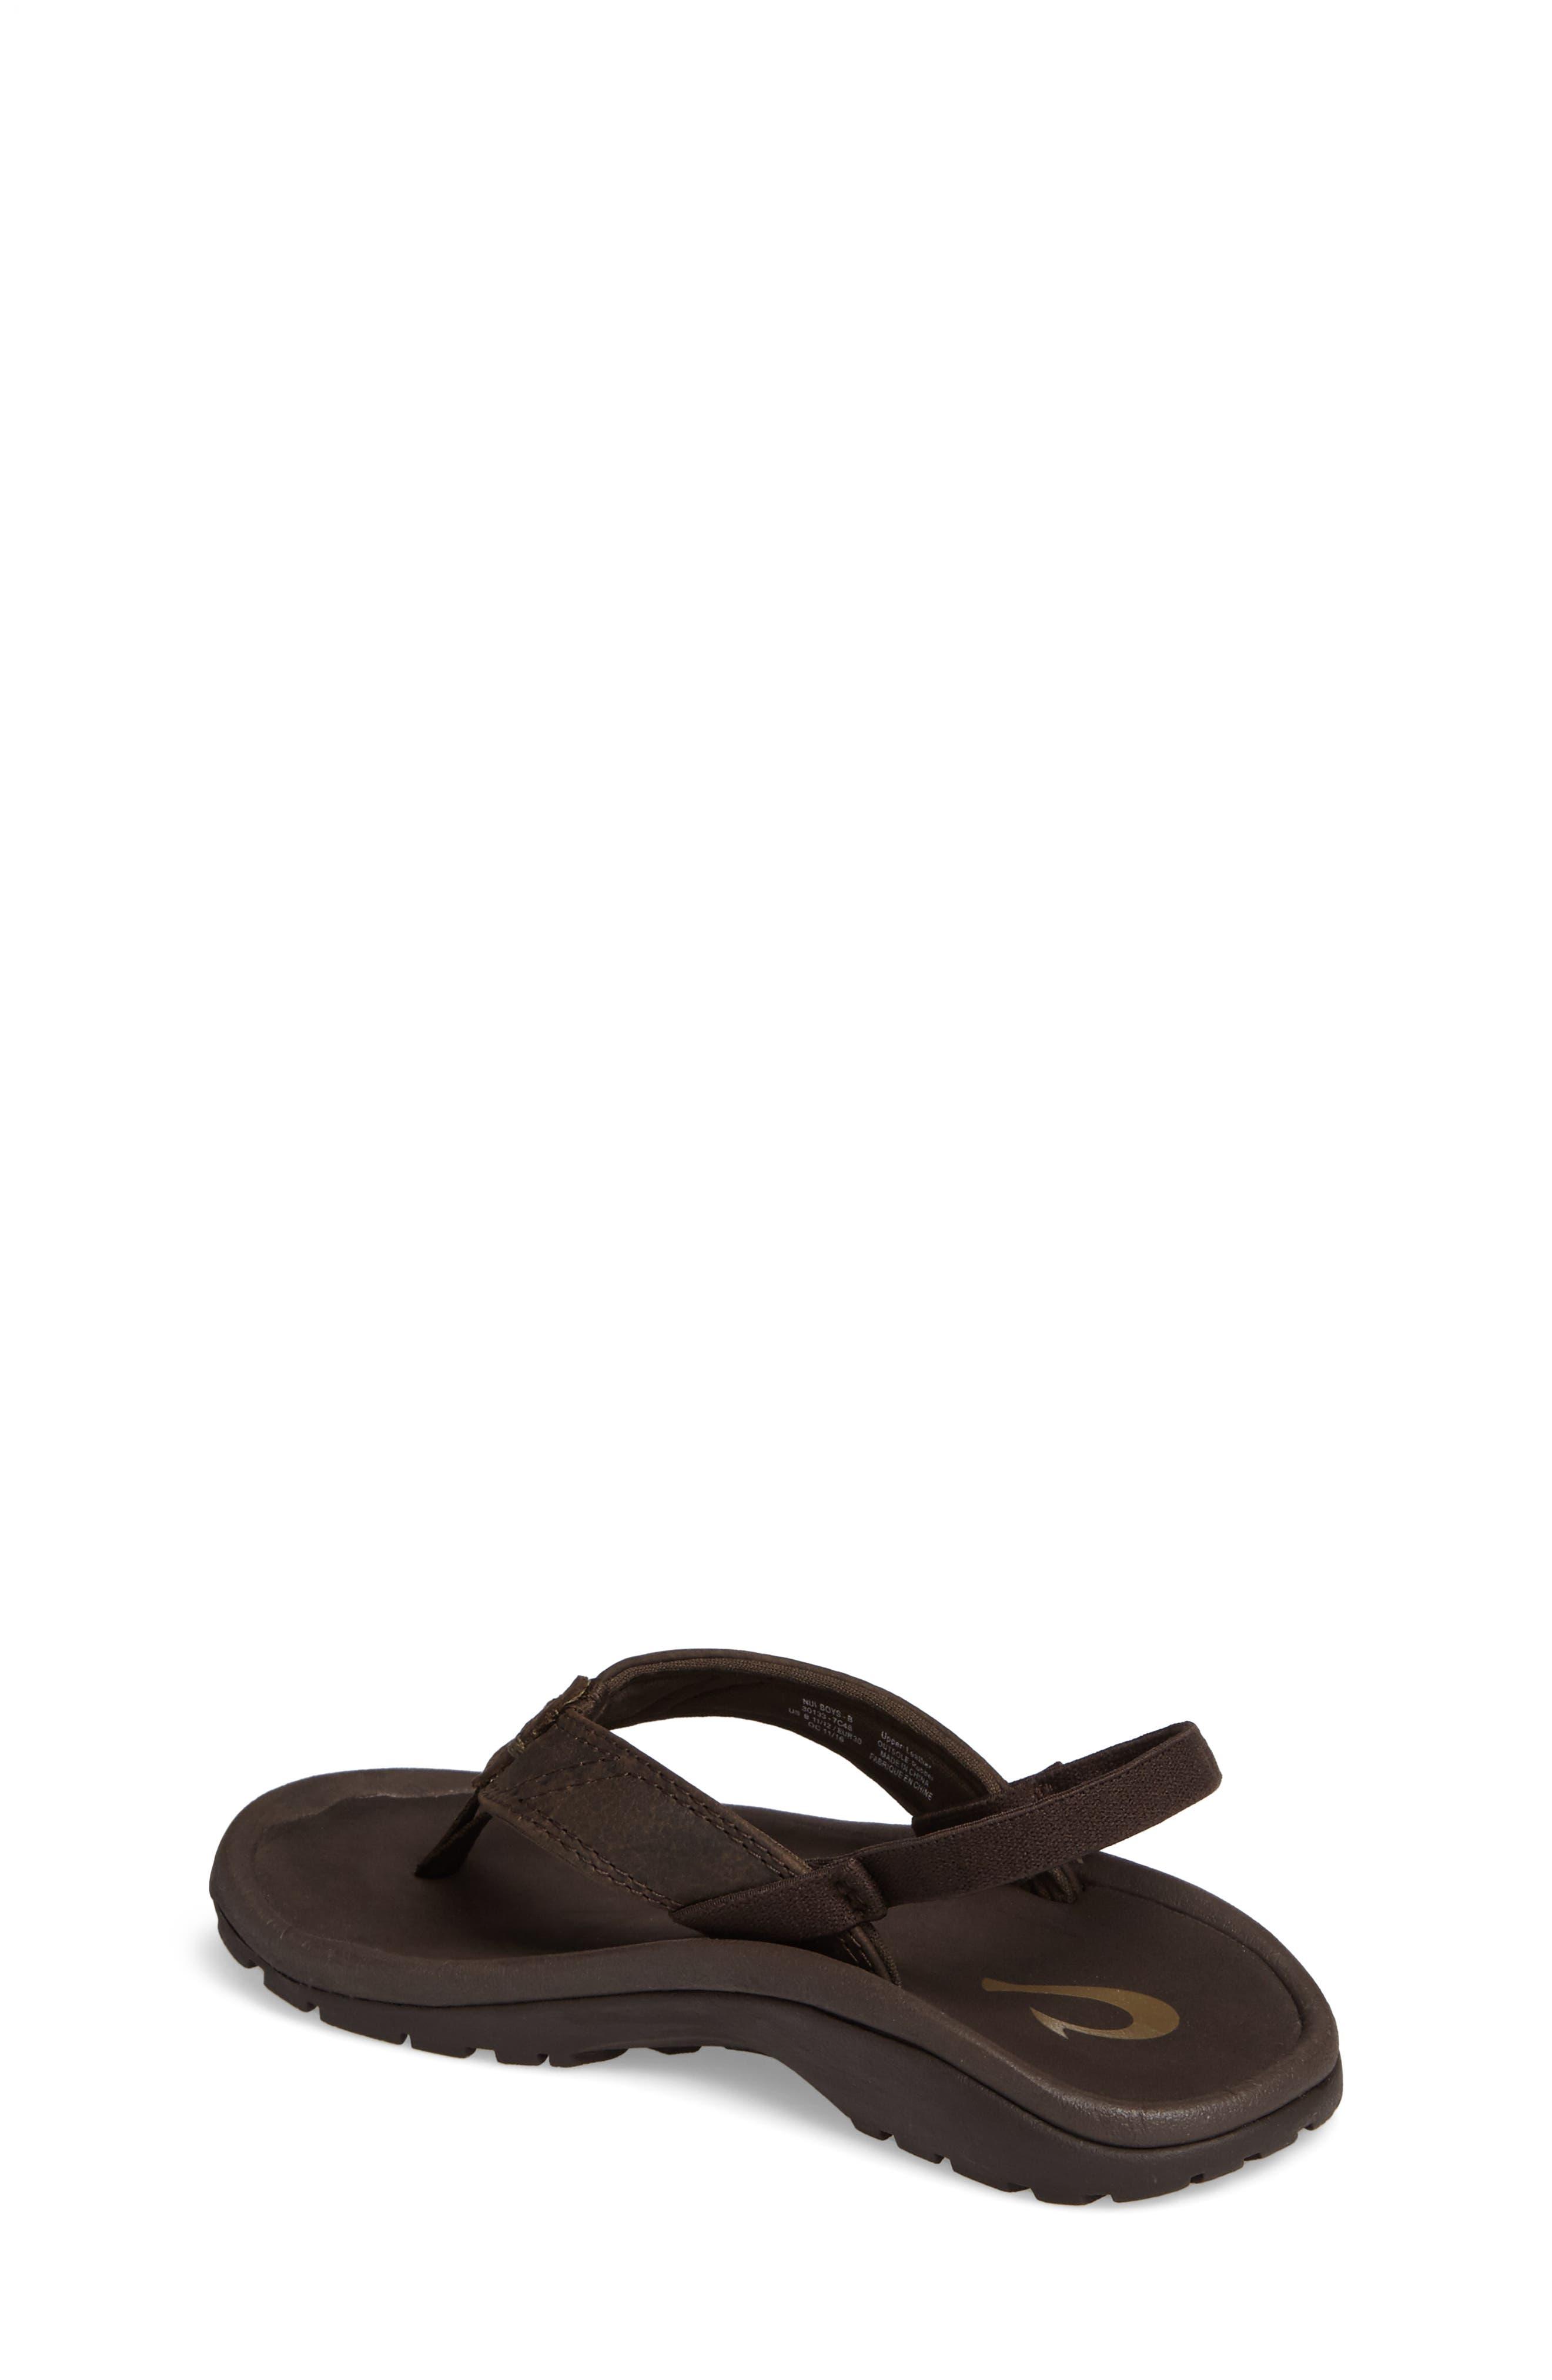 OLUKAI,                             Nui Leather Sandal,                             Alternate thumbnail 2, color,                             SEAL BROWN/ DARK JAVA